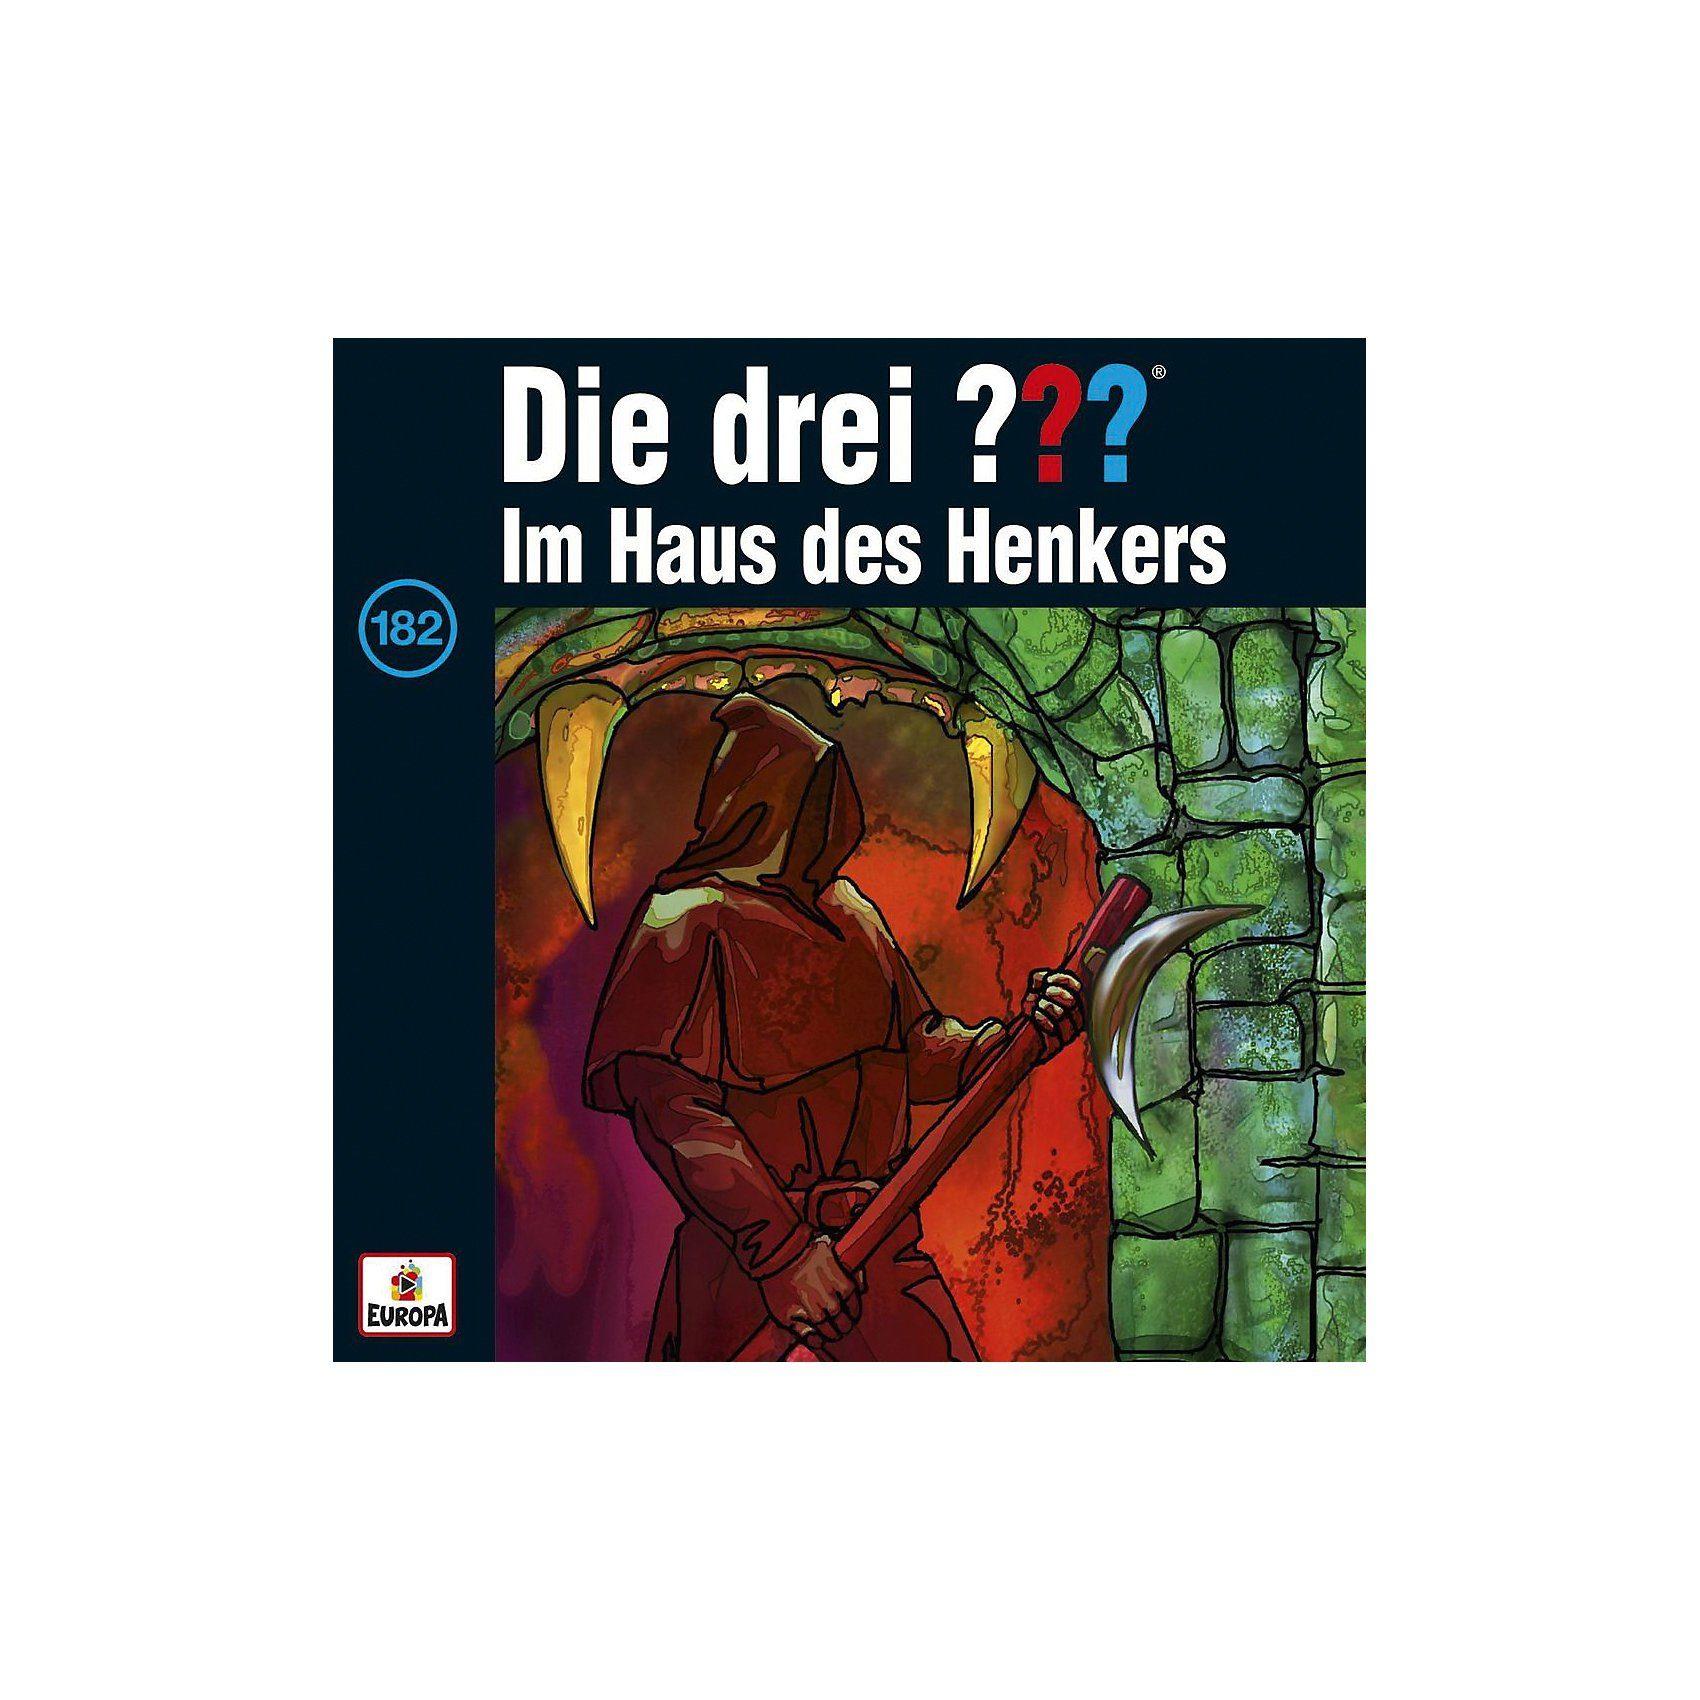 Sony CD Die Drei ??? 182 - Im Haus des Henkers